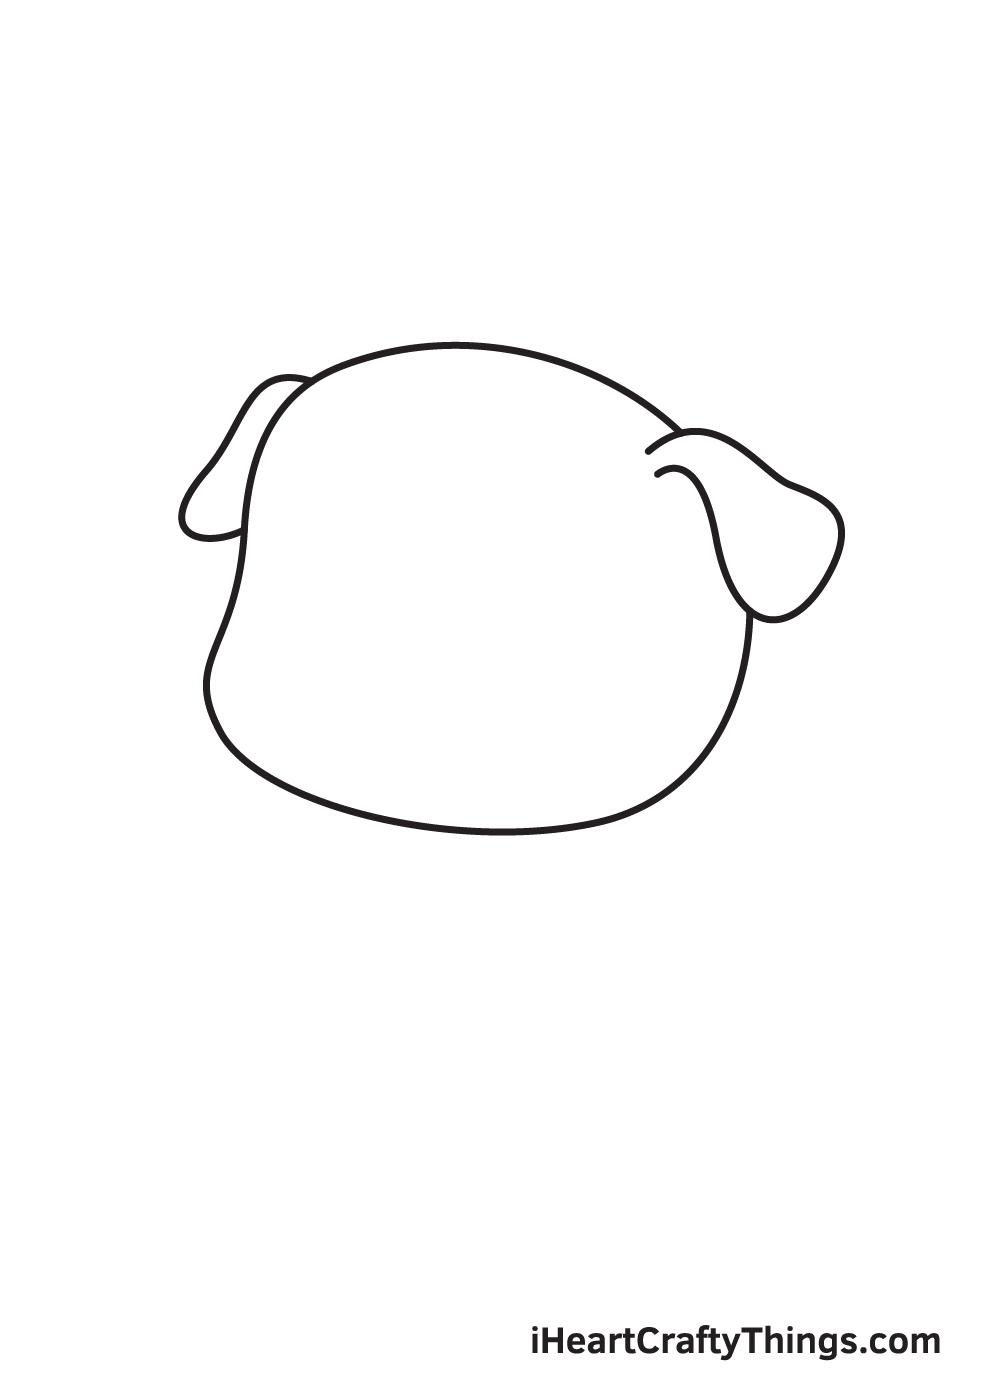 pug drawing step 2